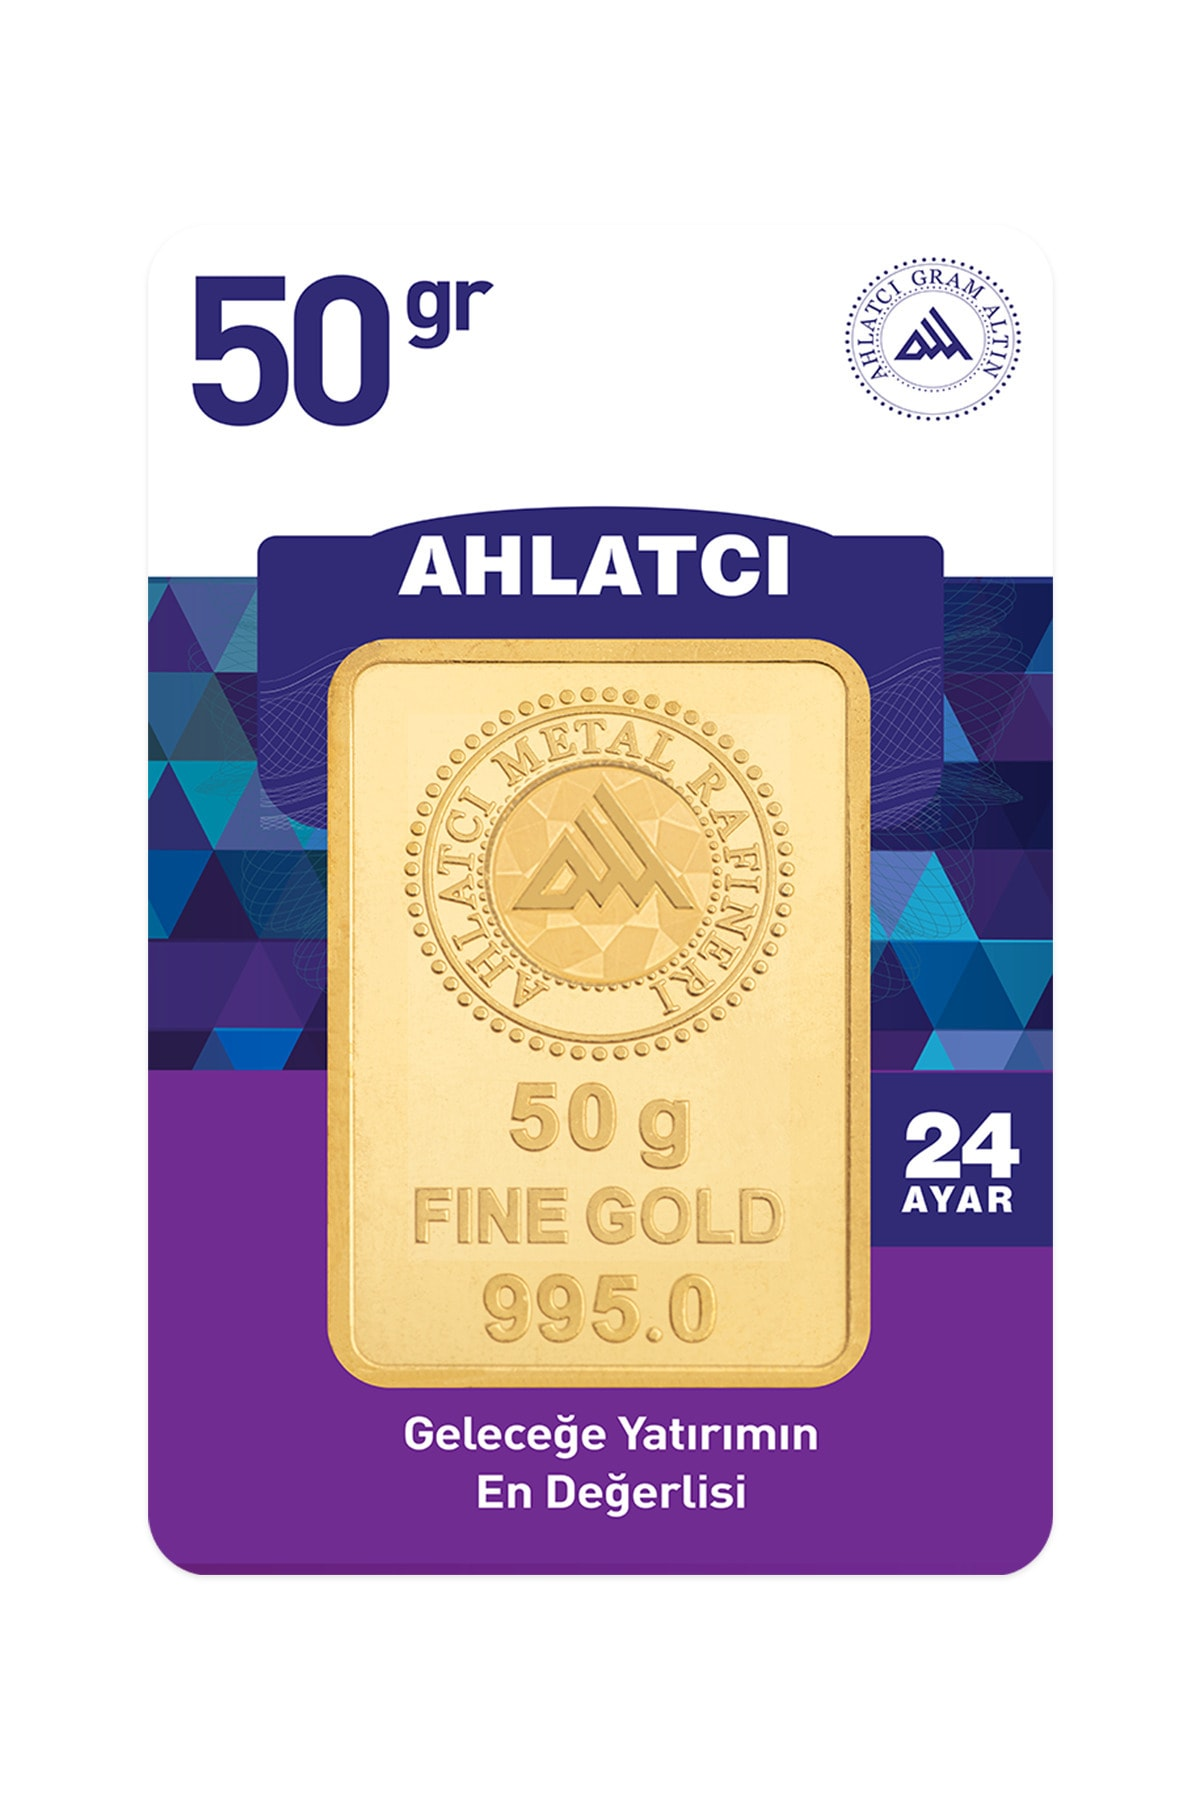 24 Ayar - 50g Altın